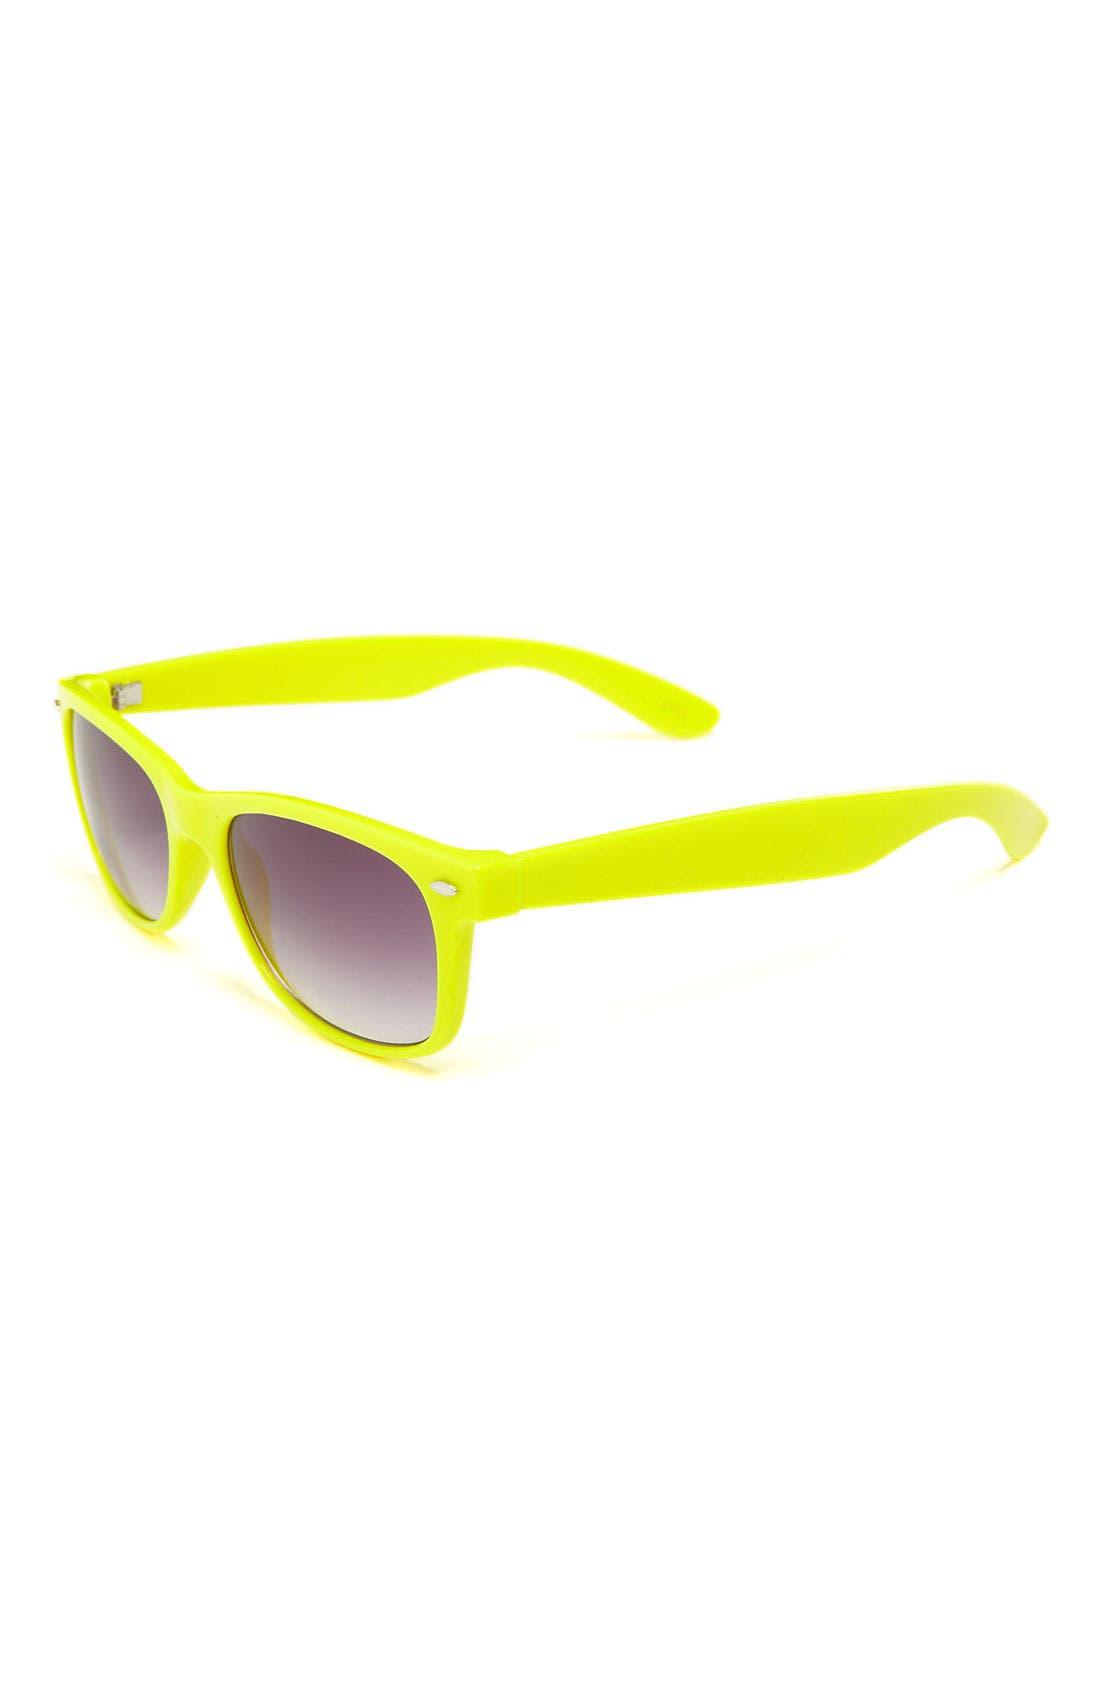 Alternate Image 1 Selected - Icon Eyewear 'Charlie' Sunglasses (Big Boys)